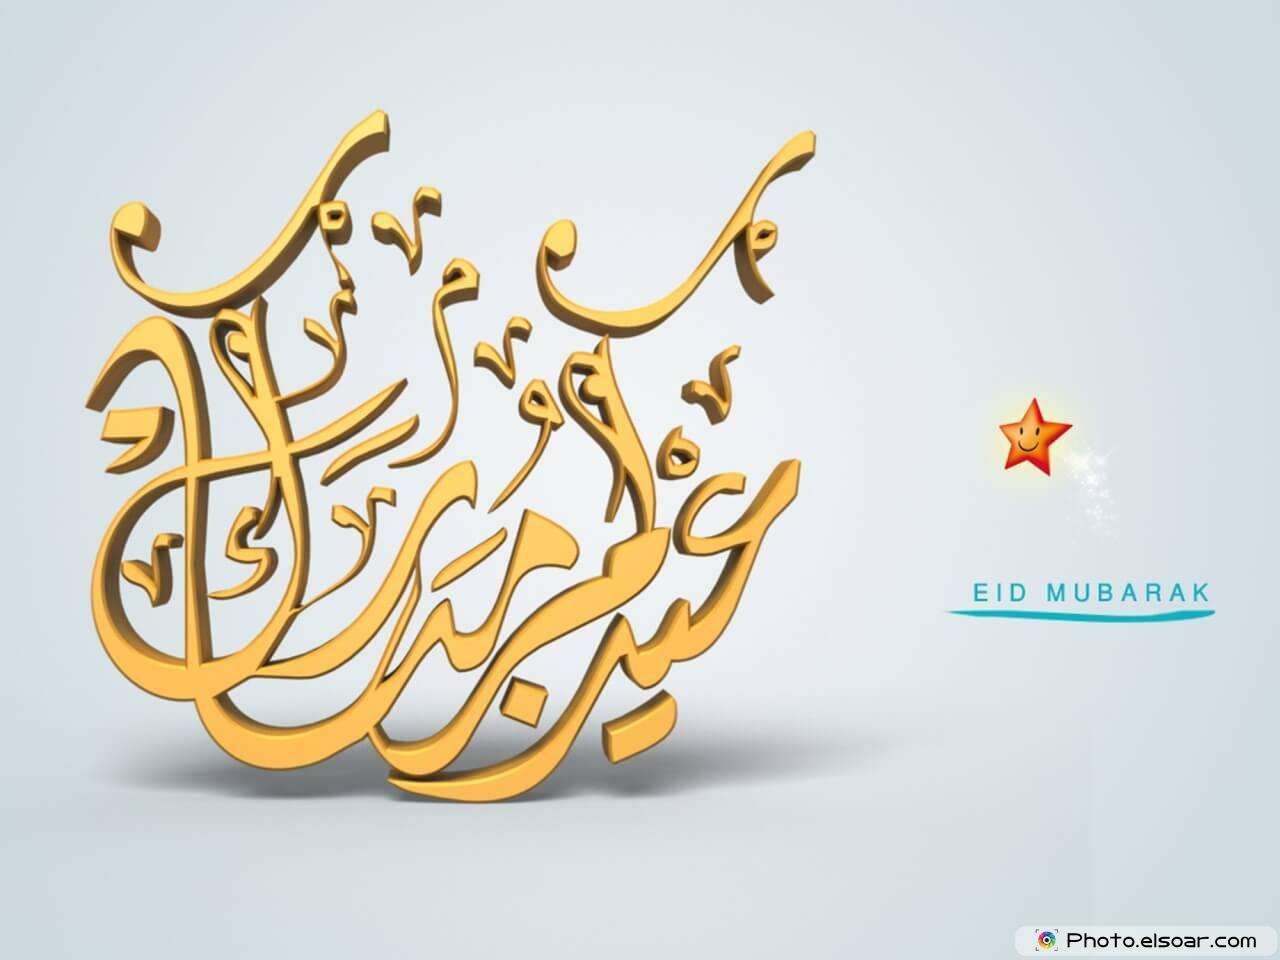 Happy Eid,Eid Mubarak Wishes,Eid Mubarak Pictures,Eid Mubarak Greetings,Eid Mubarak Wallpaper,Eid Mubarak Cards,Eid Mubarak,Eid Mubarak Image,Wishes Card